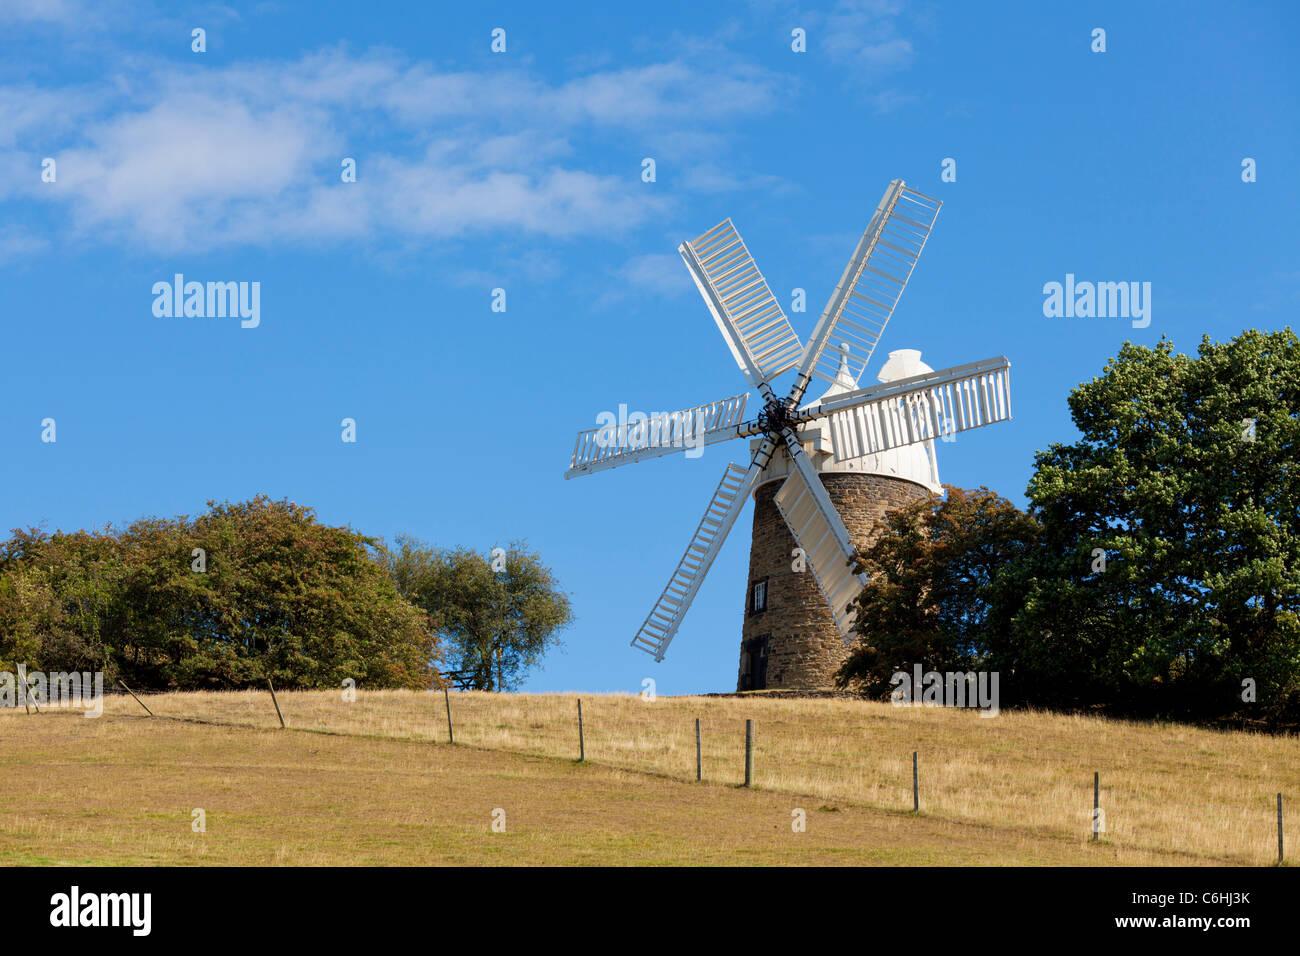 Heage Windmill a six sailed stone windmill Heage village derbyshire england uk gb eu europe - Stock Image